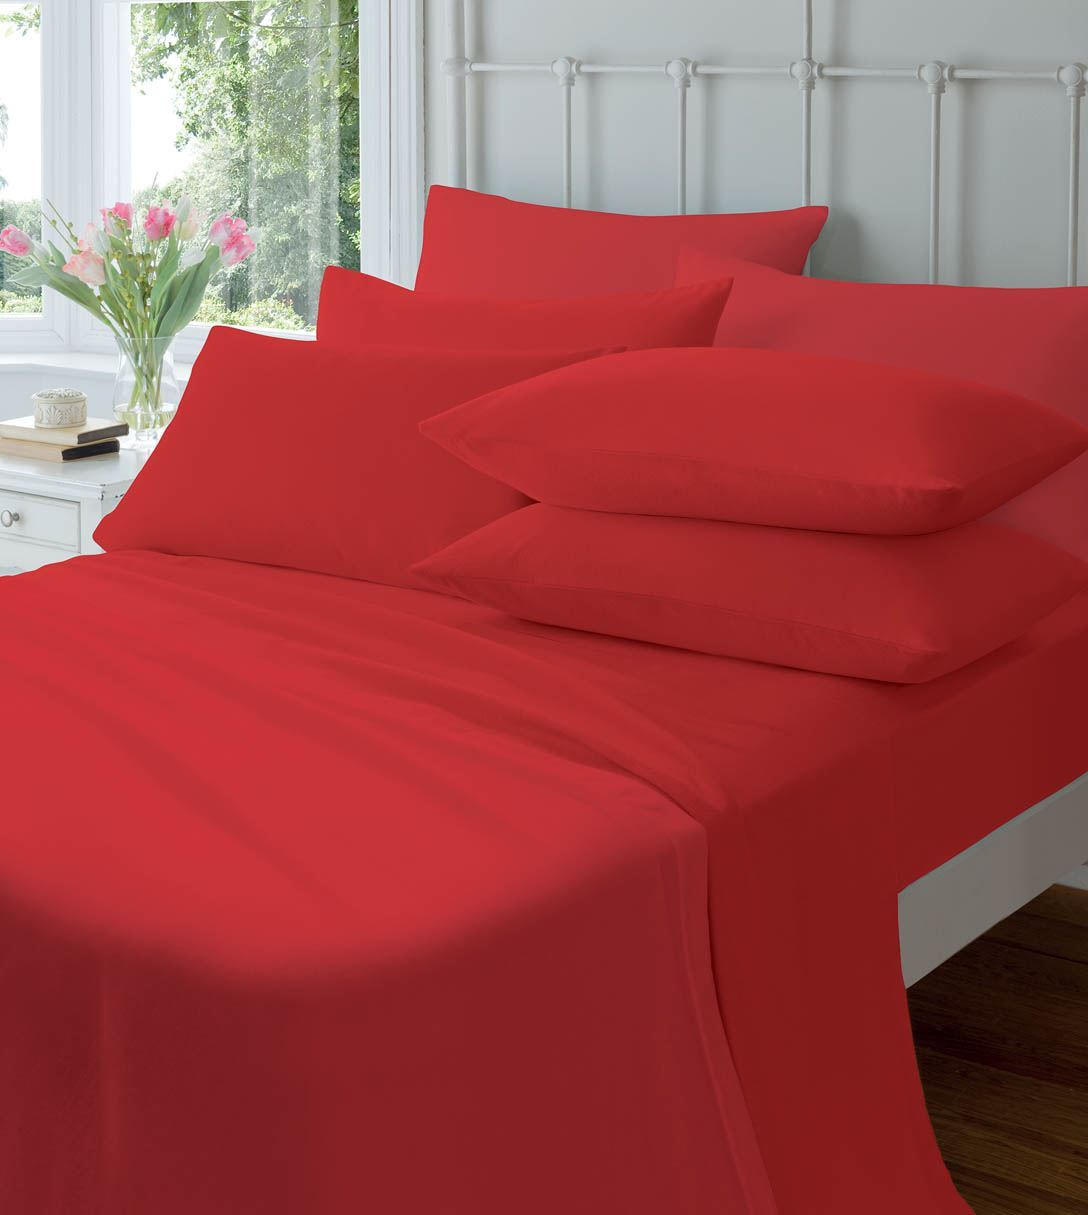 extra deep flannelette fitted sheets warm soft brushed. Black Bedroom Furniture Sets. Home Design Ideas